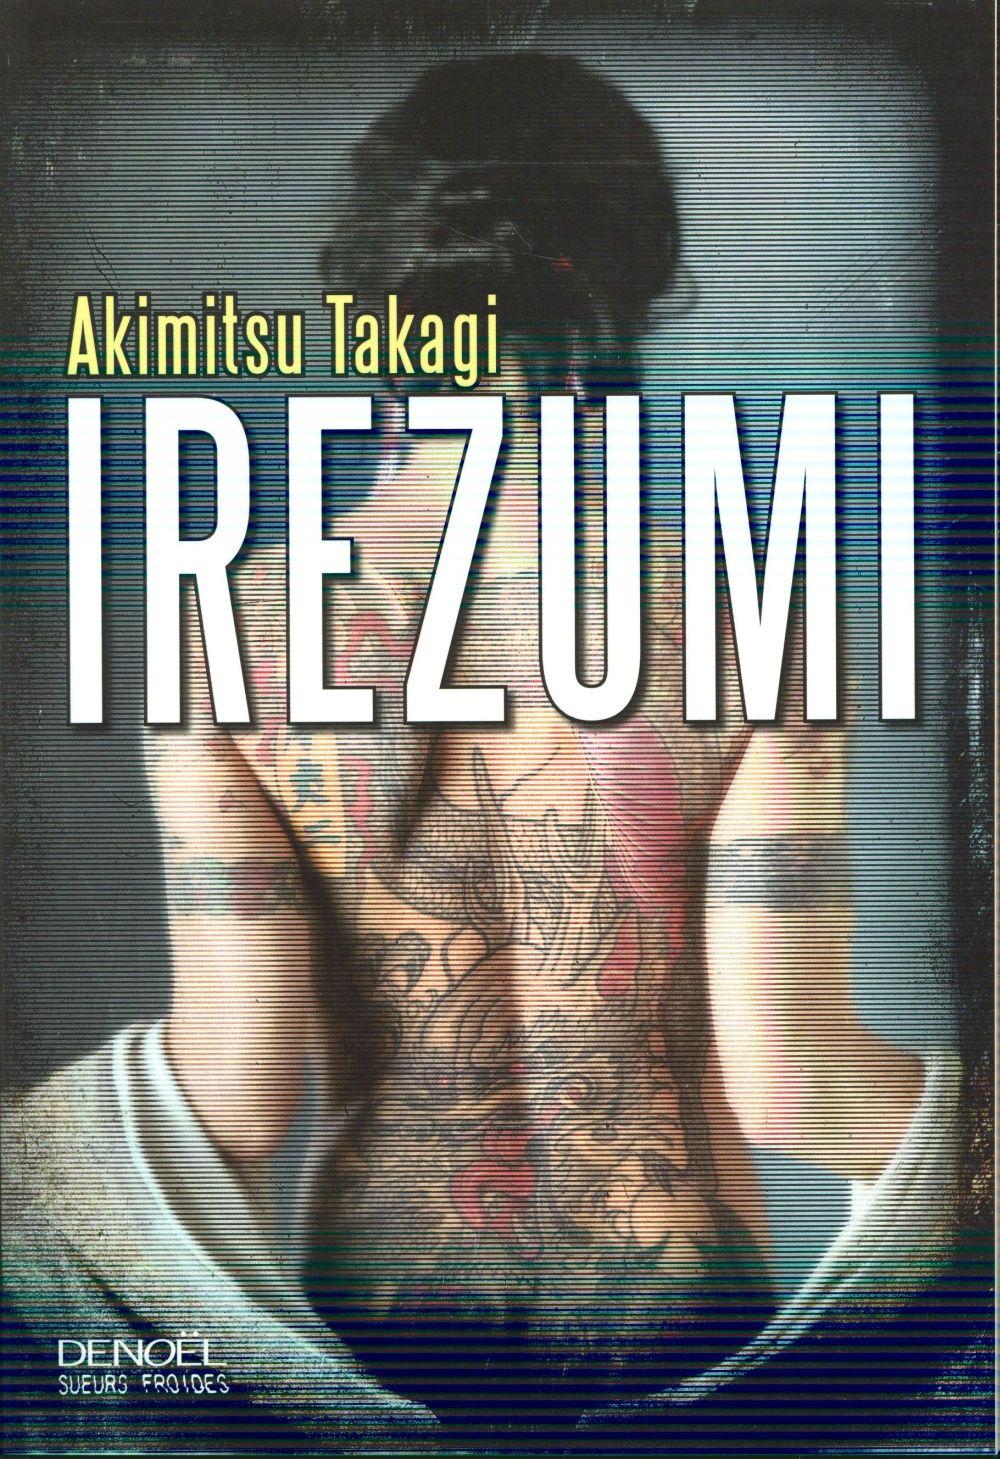 Irezumi